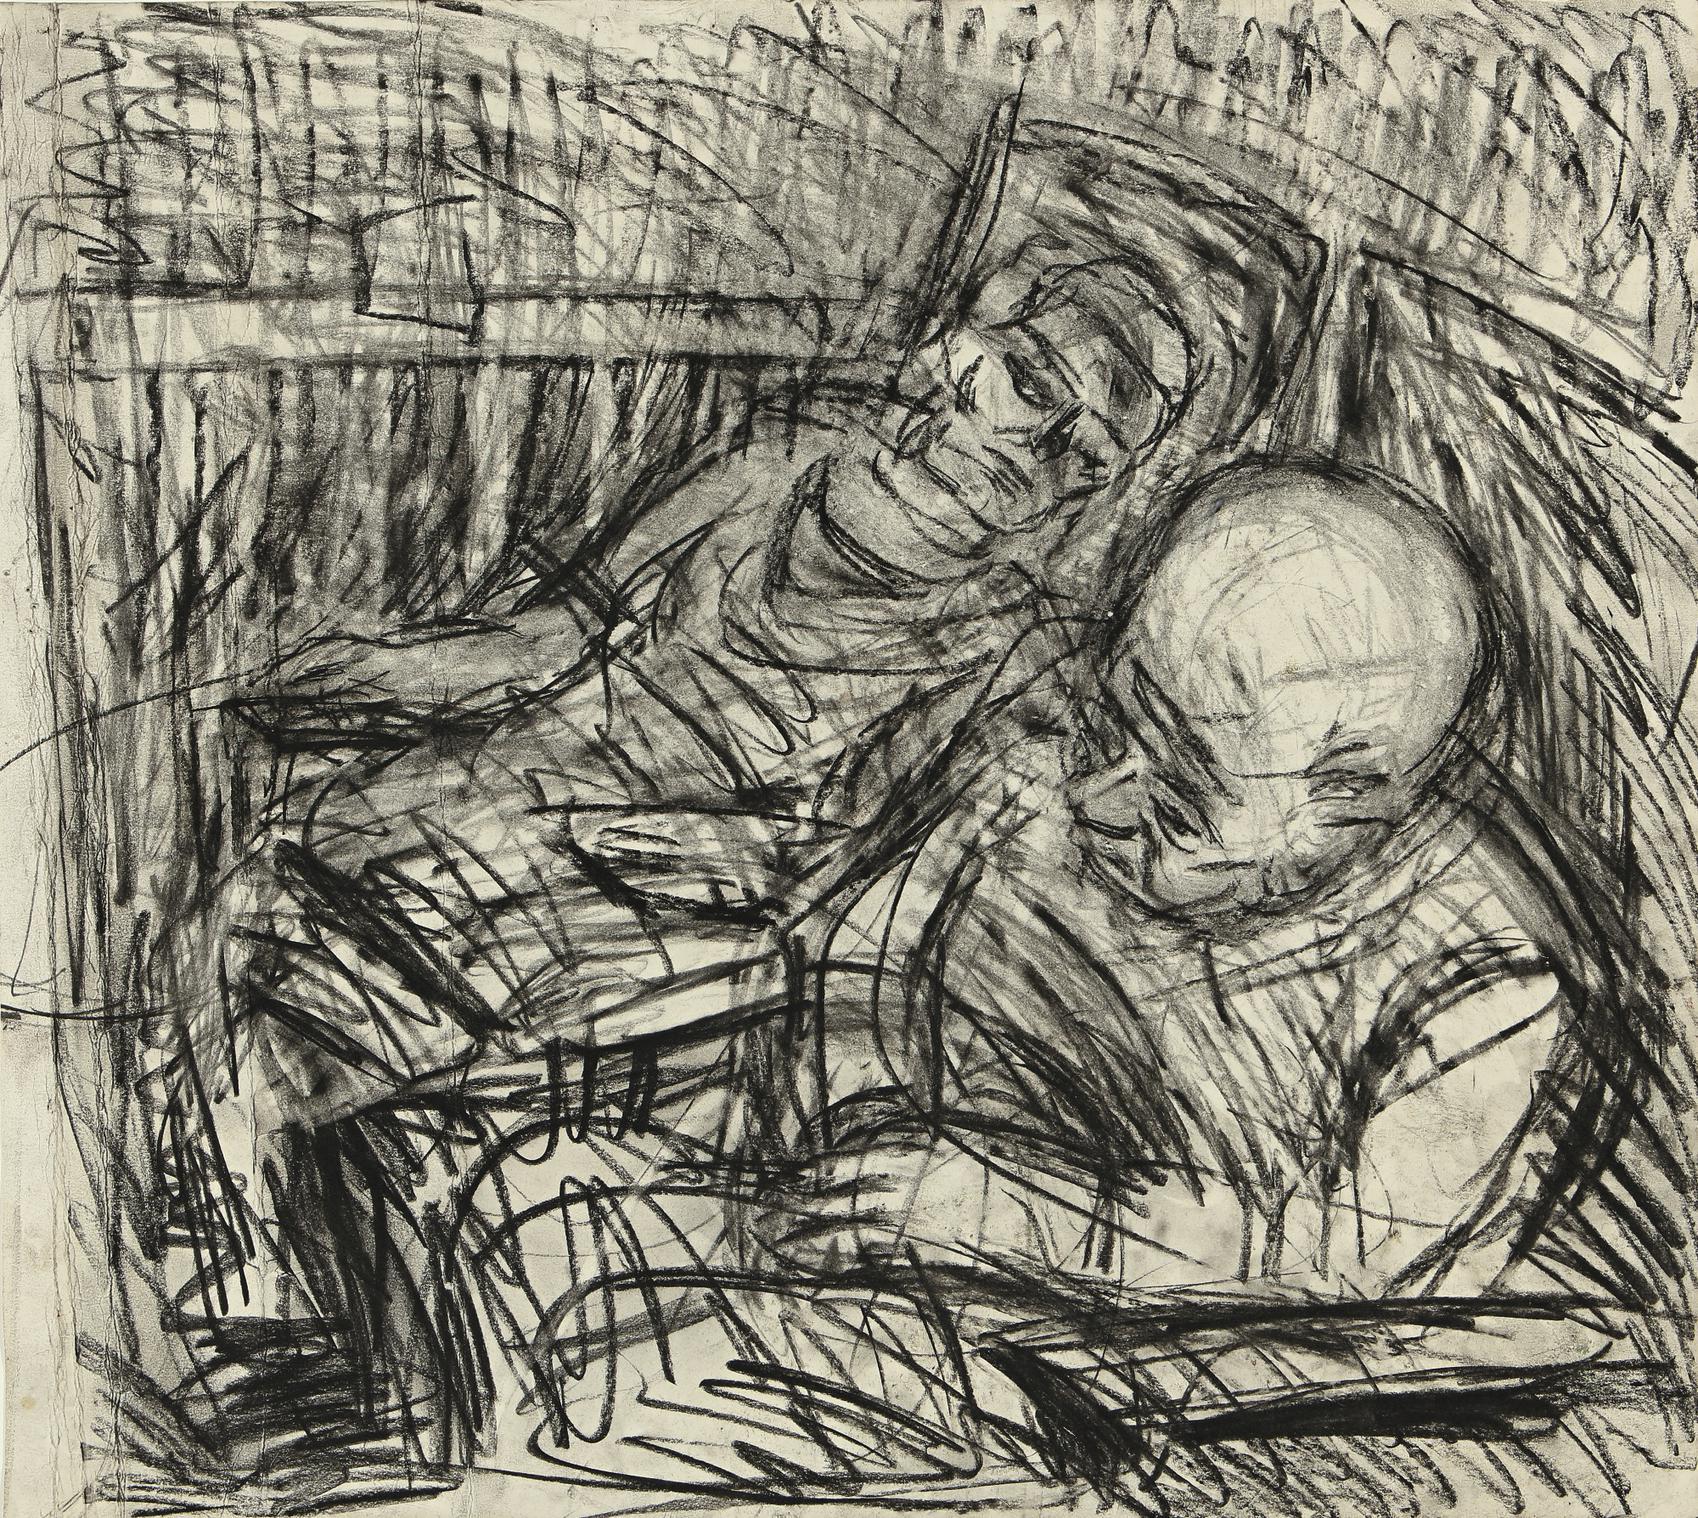 Leon Kossoff-Two Seated Figures V-1980